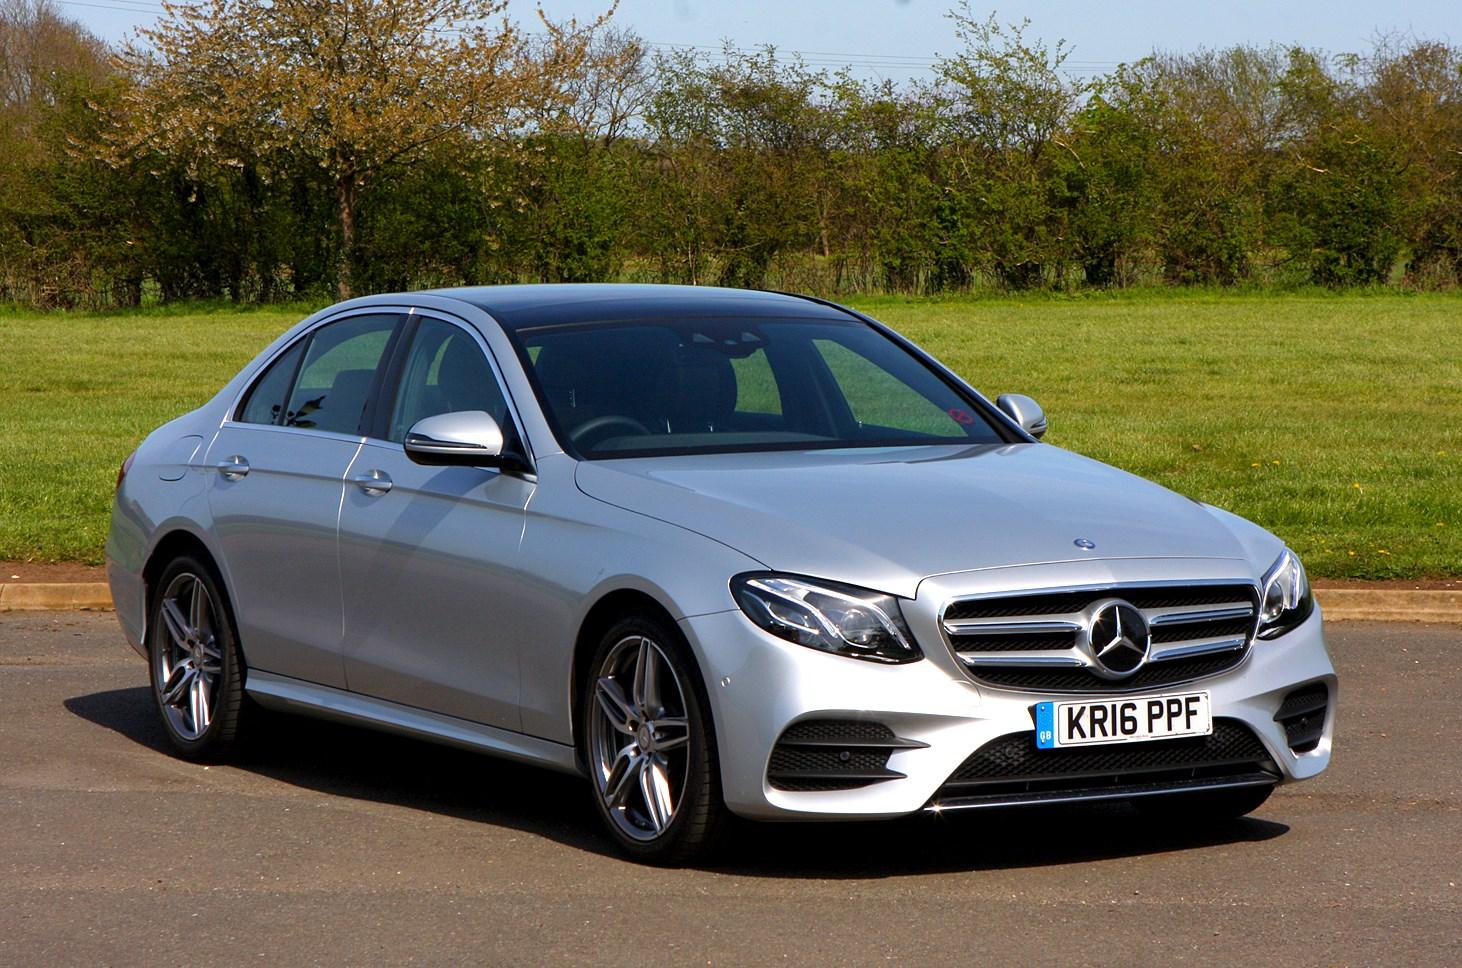 Mercedes benz e class saloon 2016 photos parkers for Mercedes benz e class images